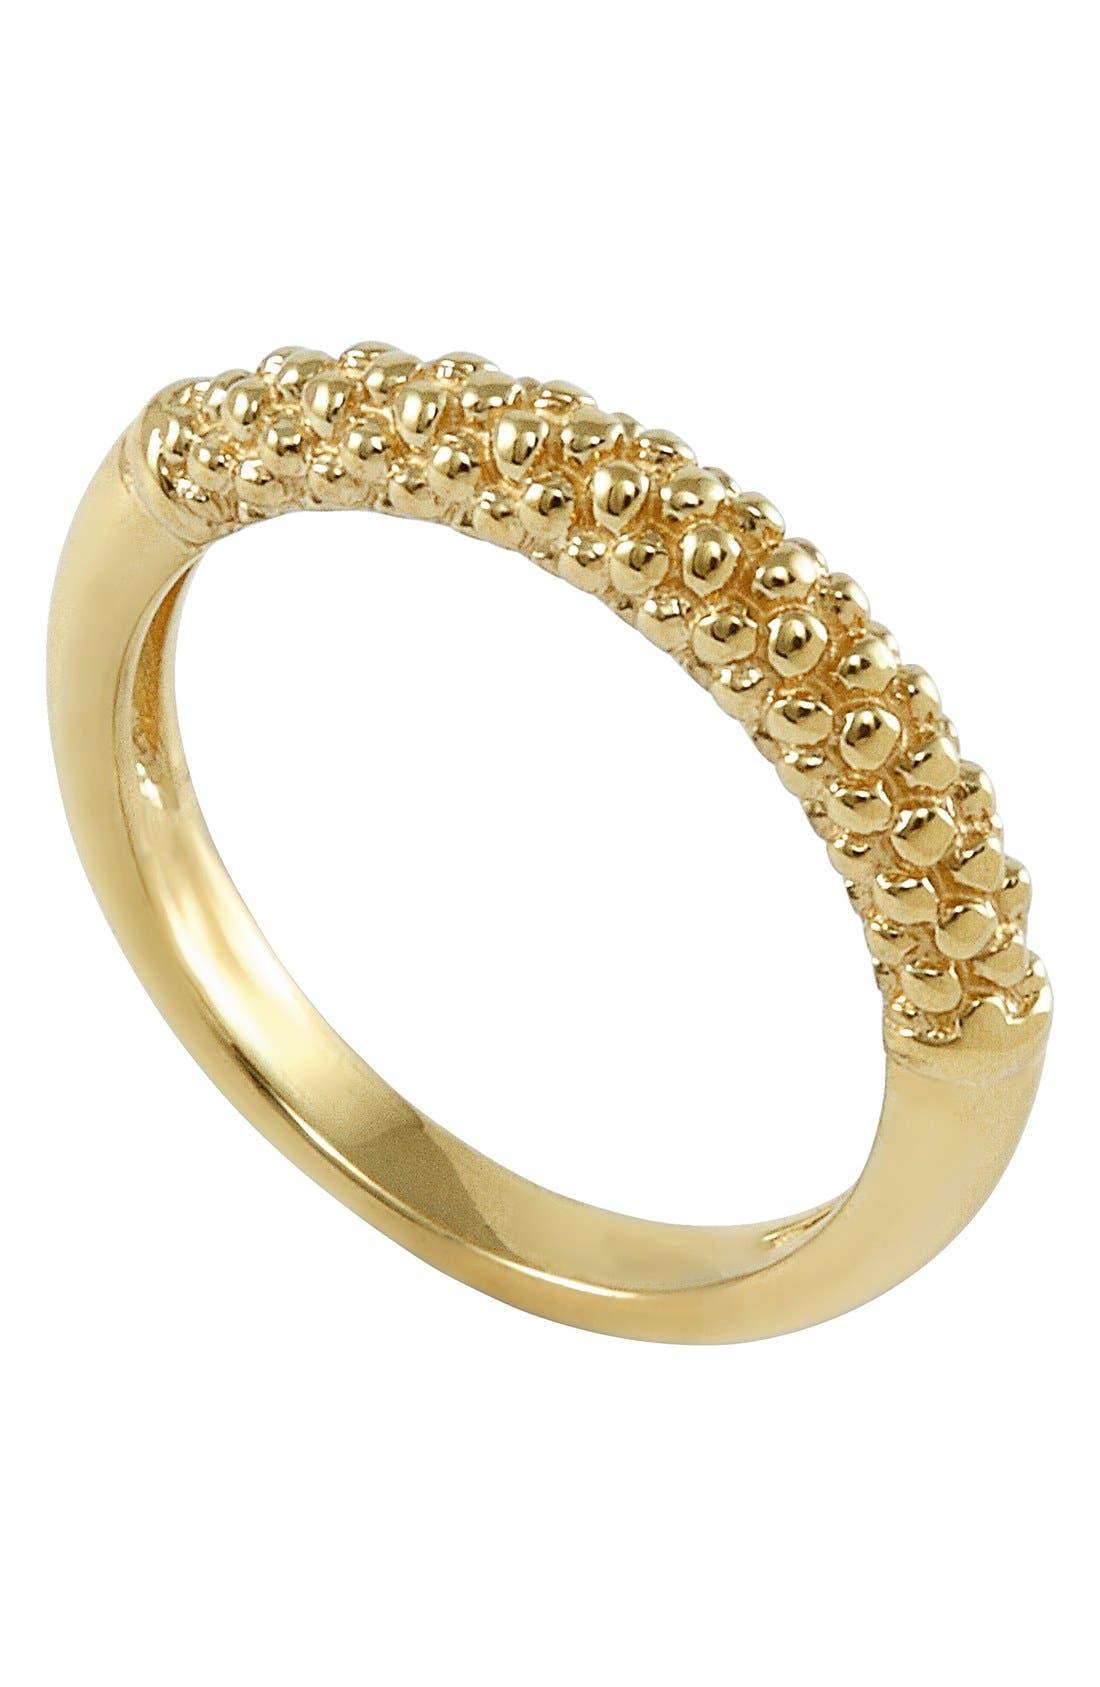 Alternate Image 1 Selected - LAGOS Caviar Band Ring